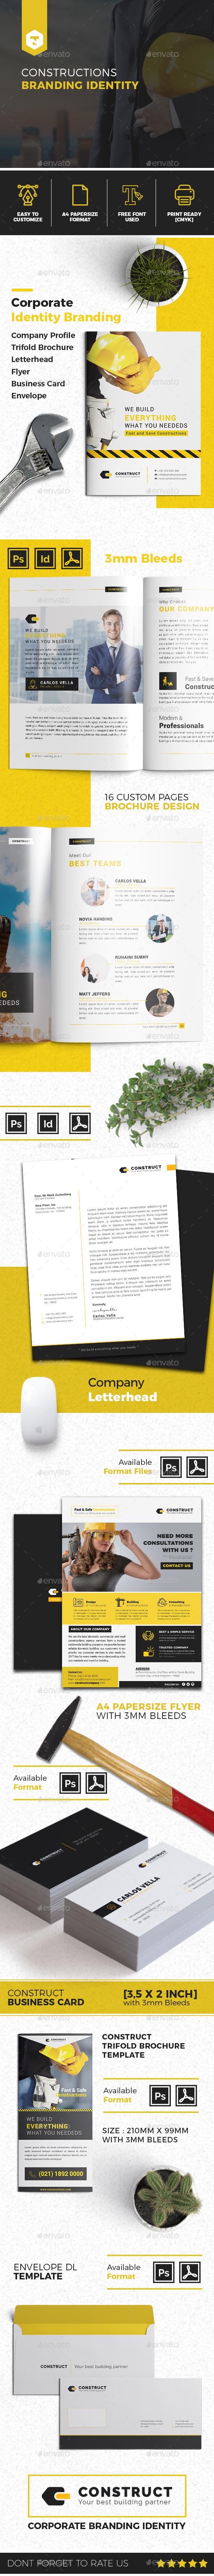 Constructions Corporate Branding Identity - Print Templates